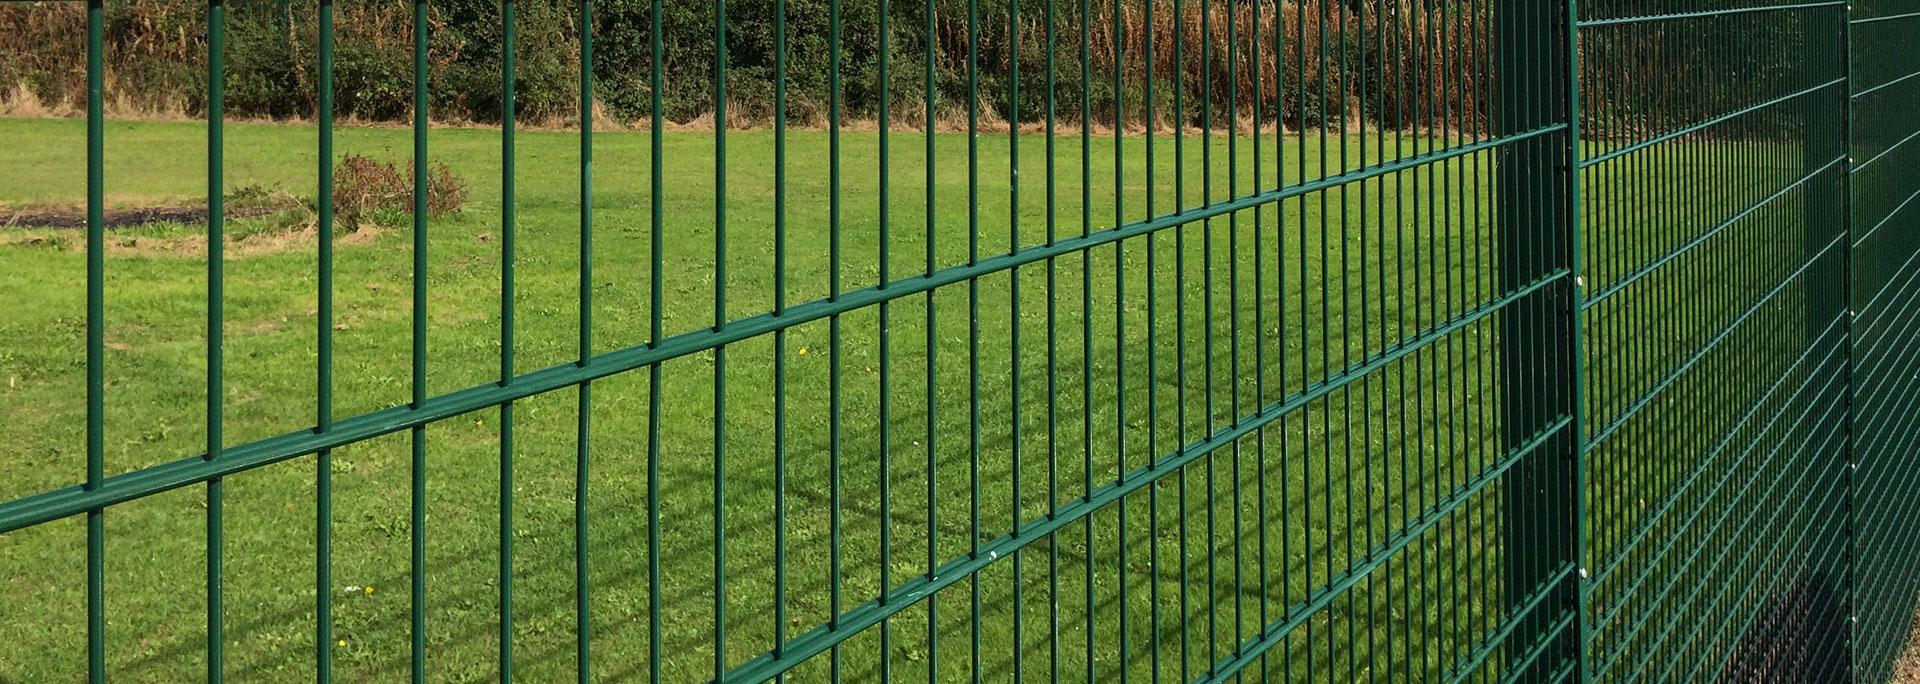 Ball Court Fencing Slider 2